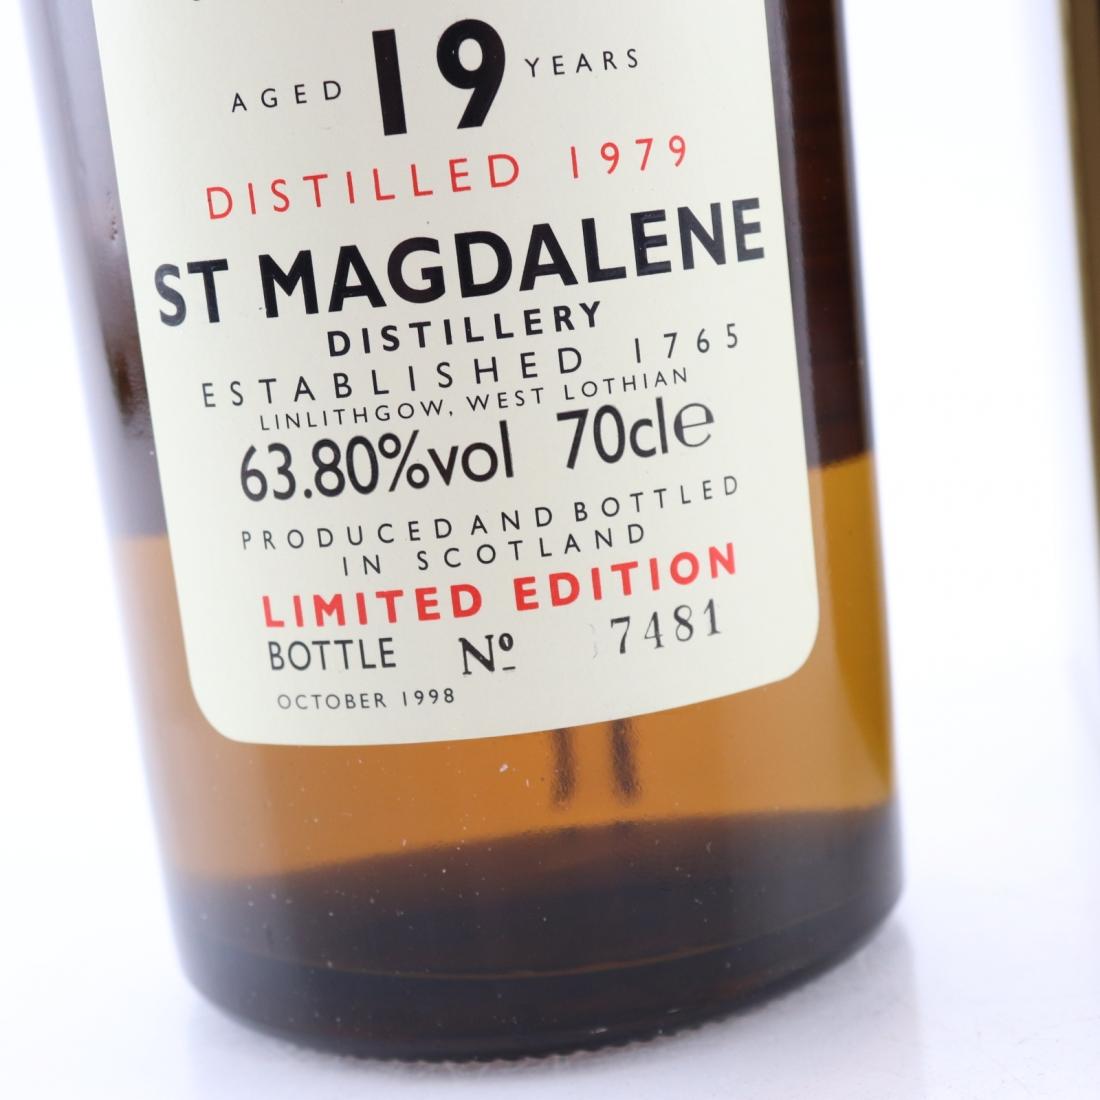 St Magdalene 1979 Rare Malt 19 Year Old / 63.80%